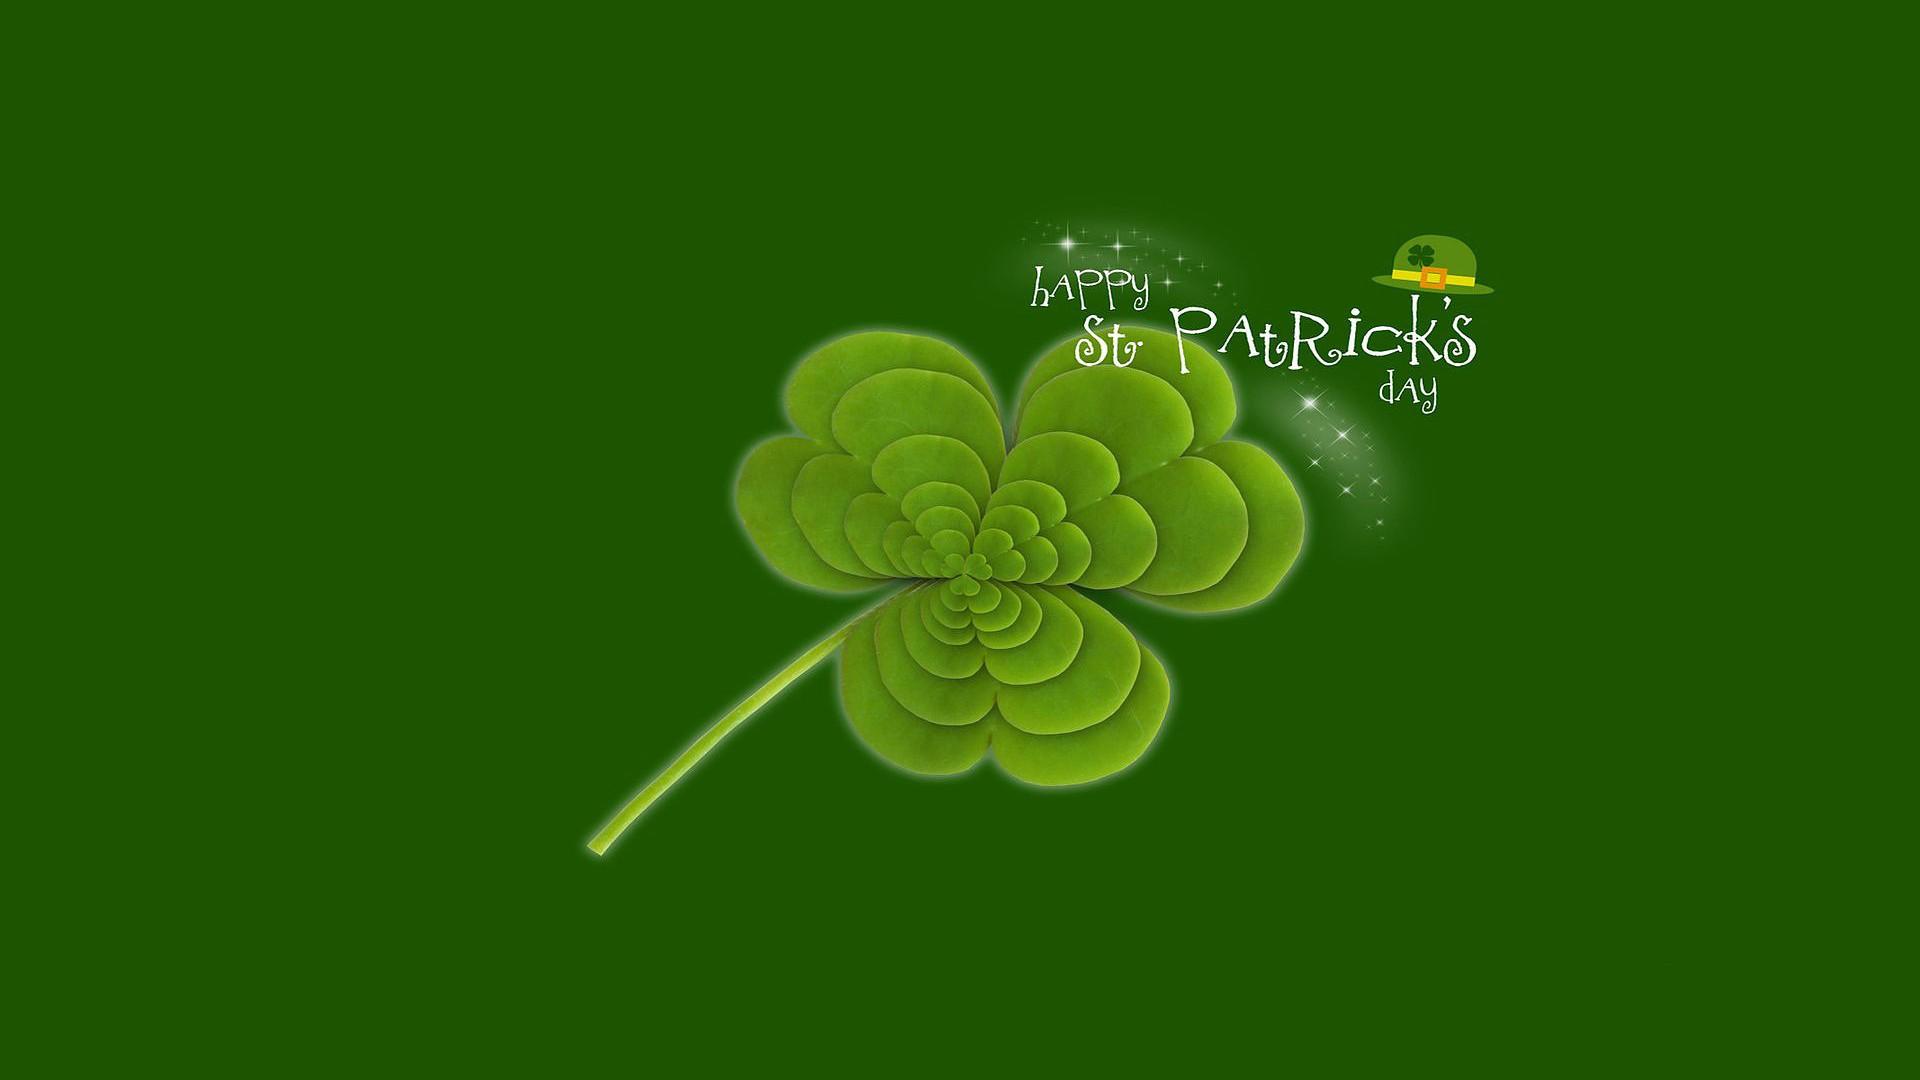 St. Patrick's Day 2021 computer wallpaper